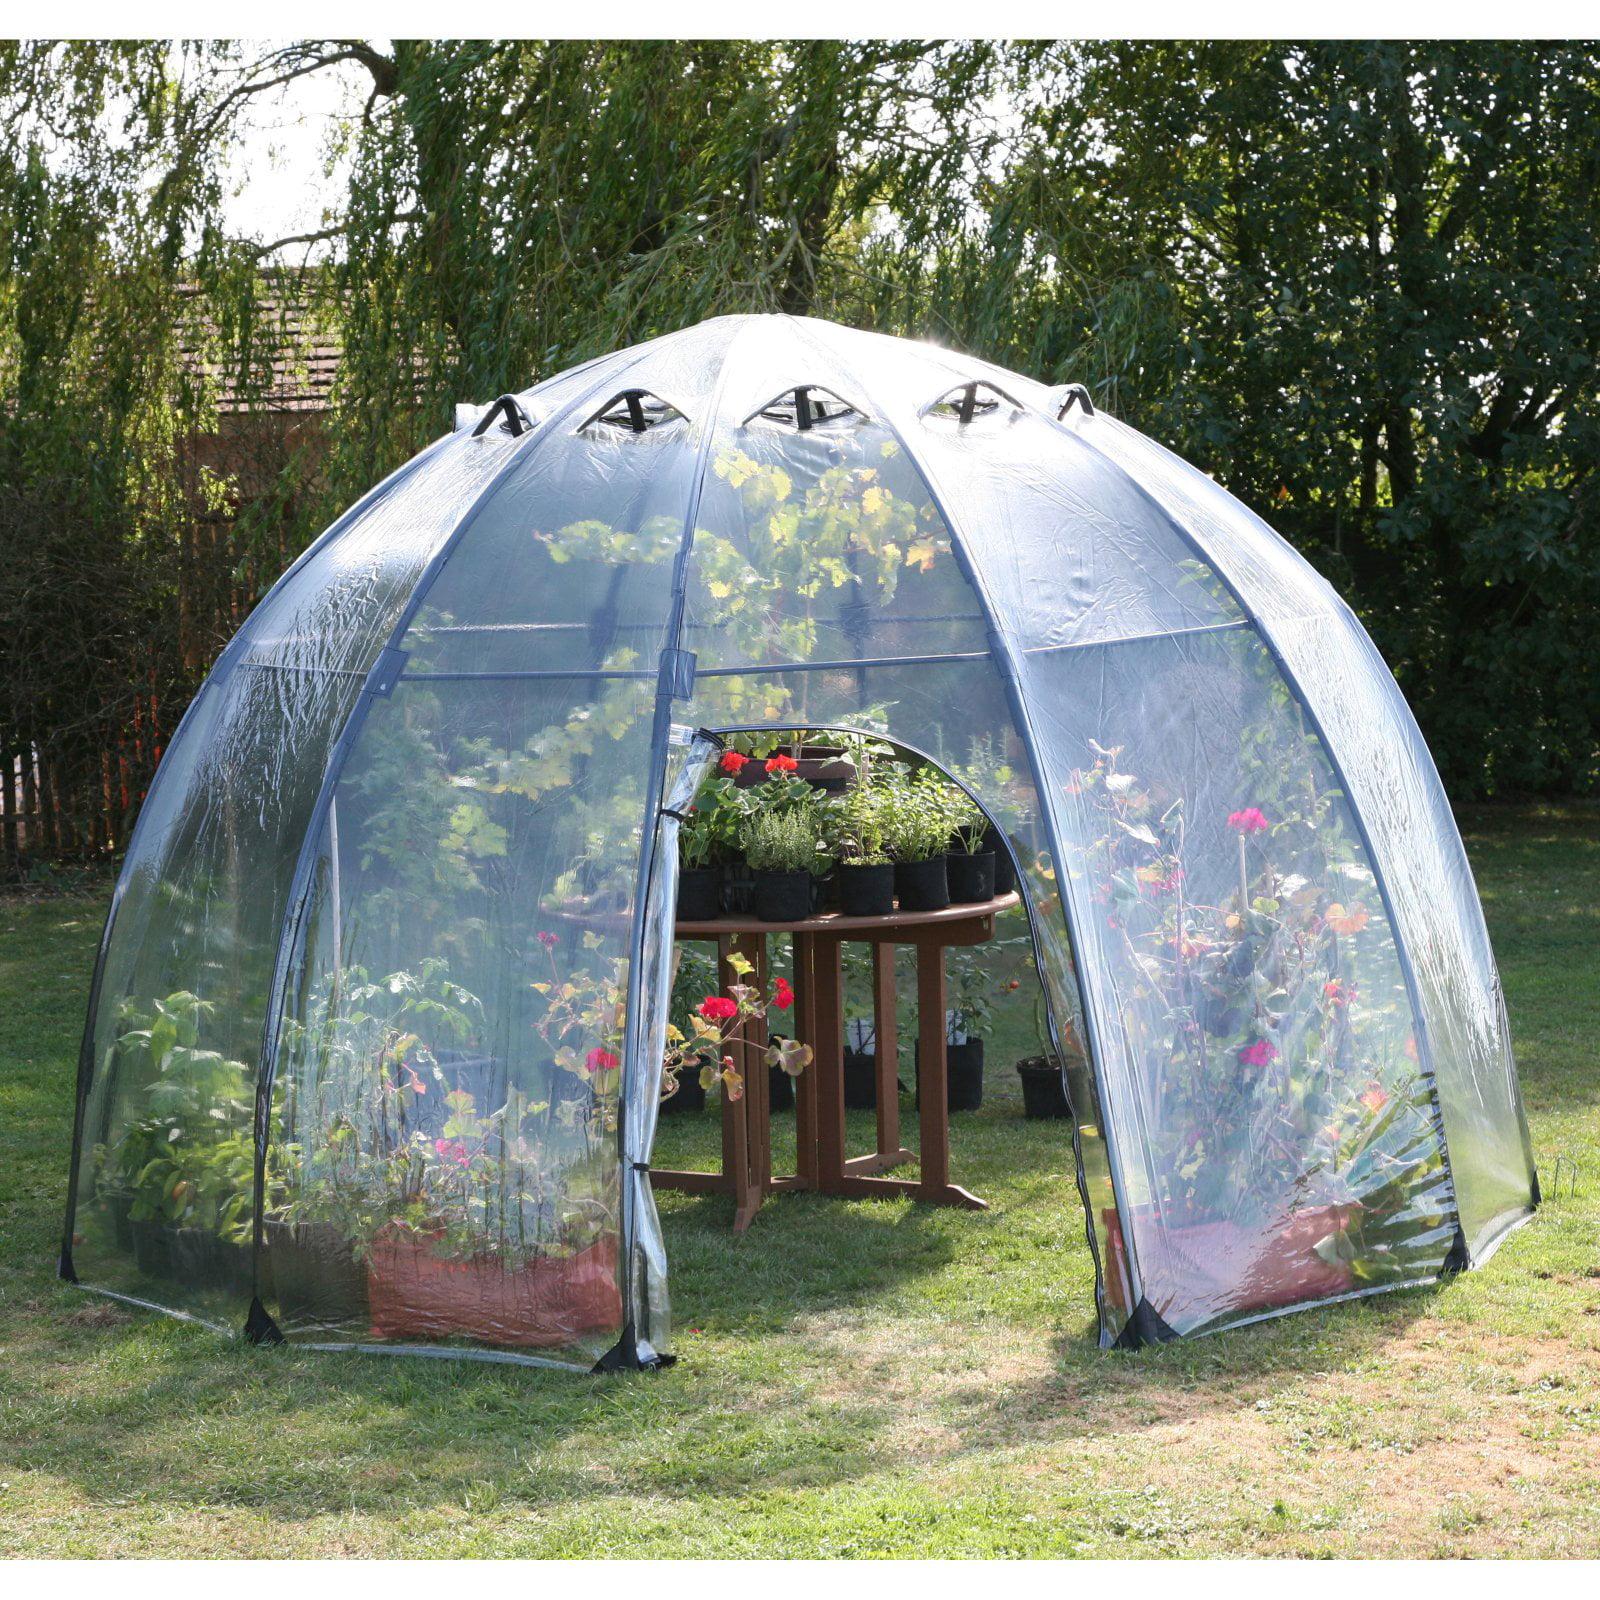 Tierra Garden Haxnicks Garden Sunbubble Greenhouse by TDI Brands